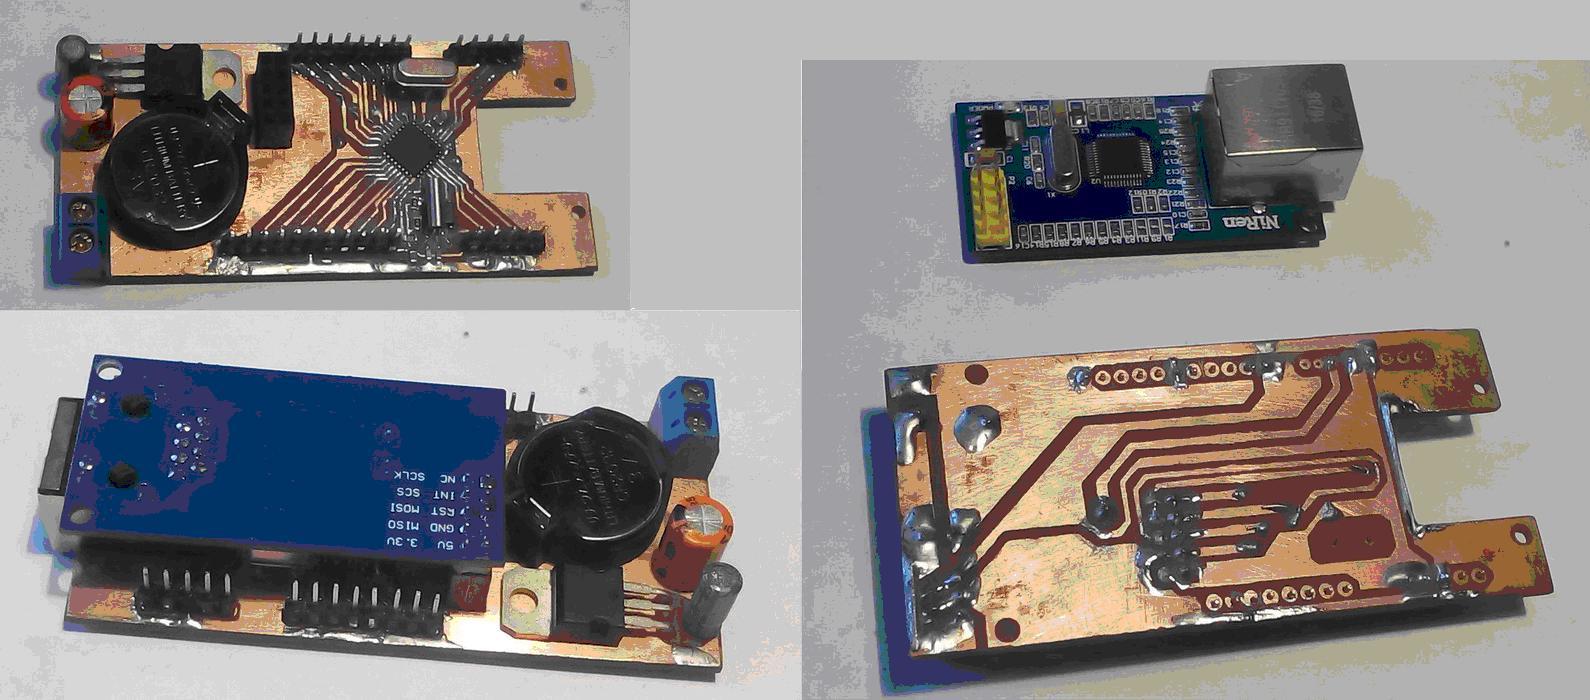 Разработка TELNET-сервера на базе W5500 и ATMEGA8 - 12